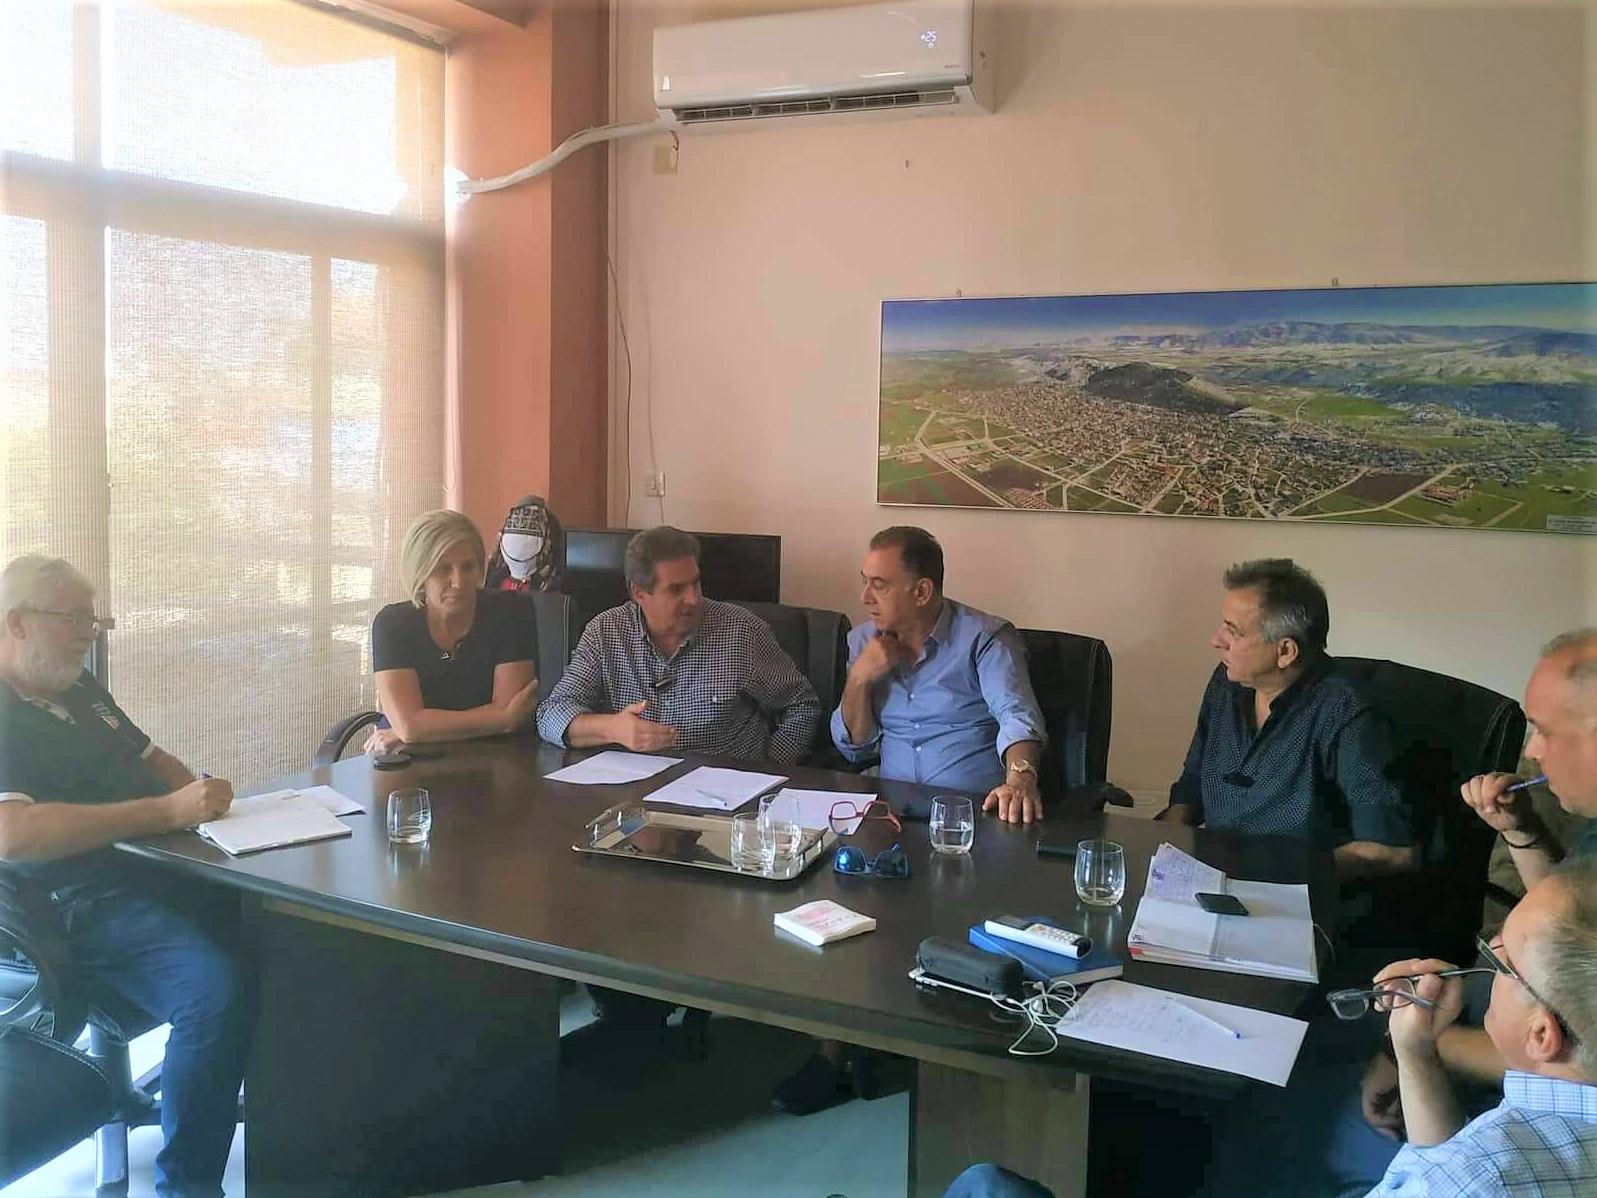 Photo of Συνάντηση του δημάρχου Φαρσάλων Μ. Εσκίογλου με τον βουλευτή Χρ. Κέλλα